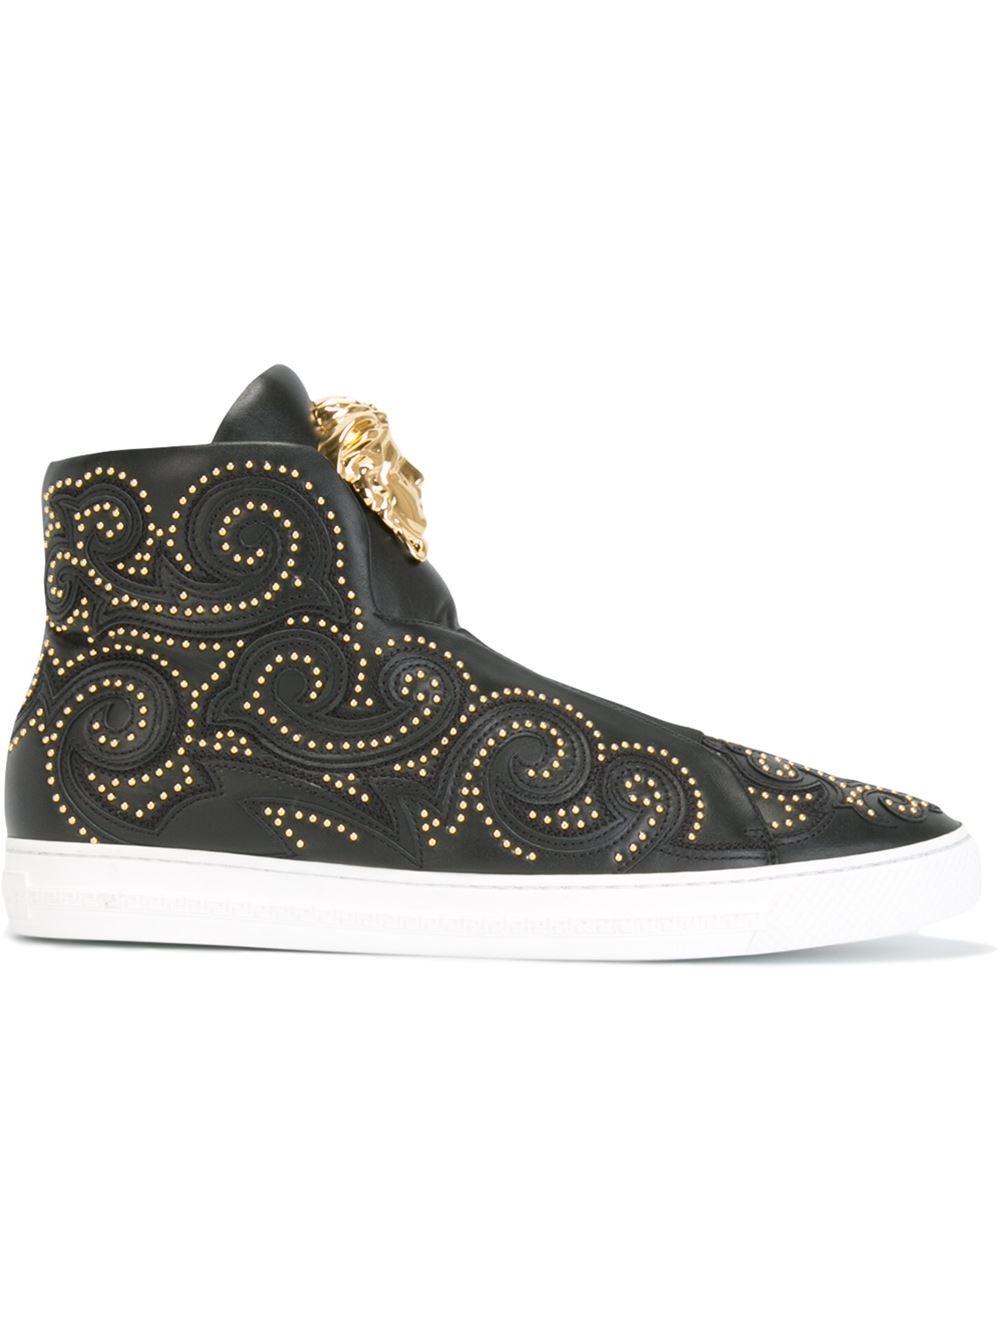 Versace Palazzo Hi Top Sneakers In Black For Men Save 30 Lyst